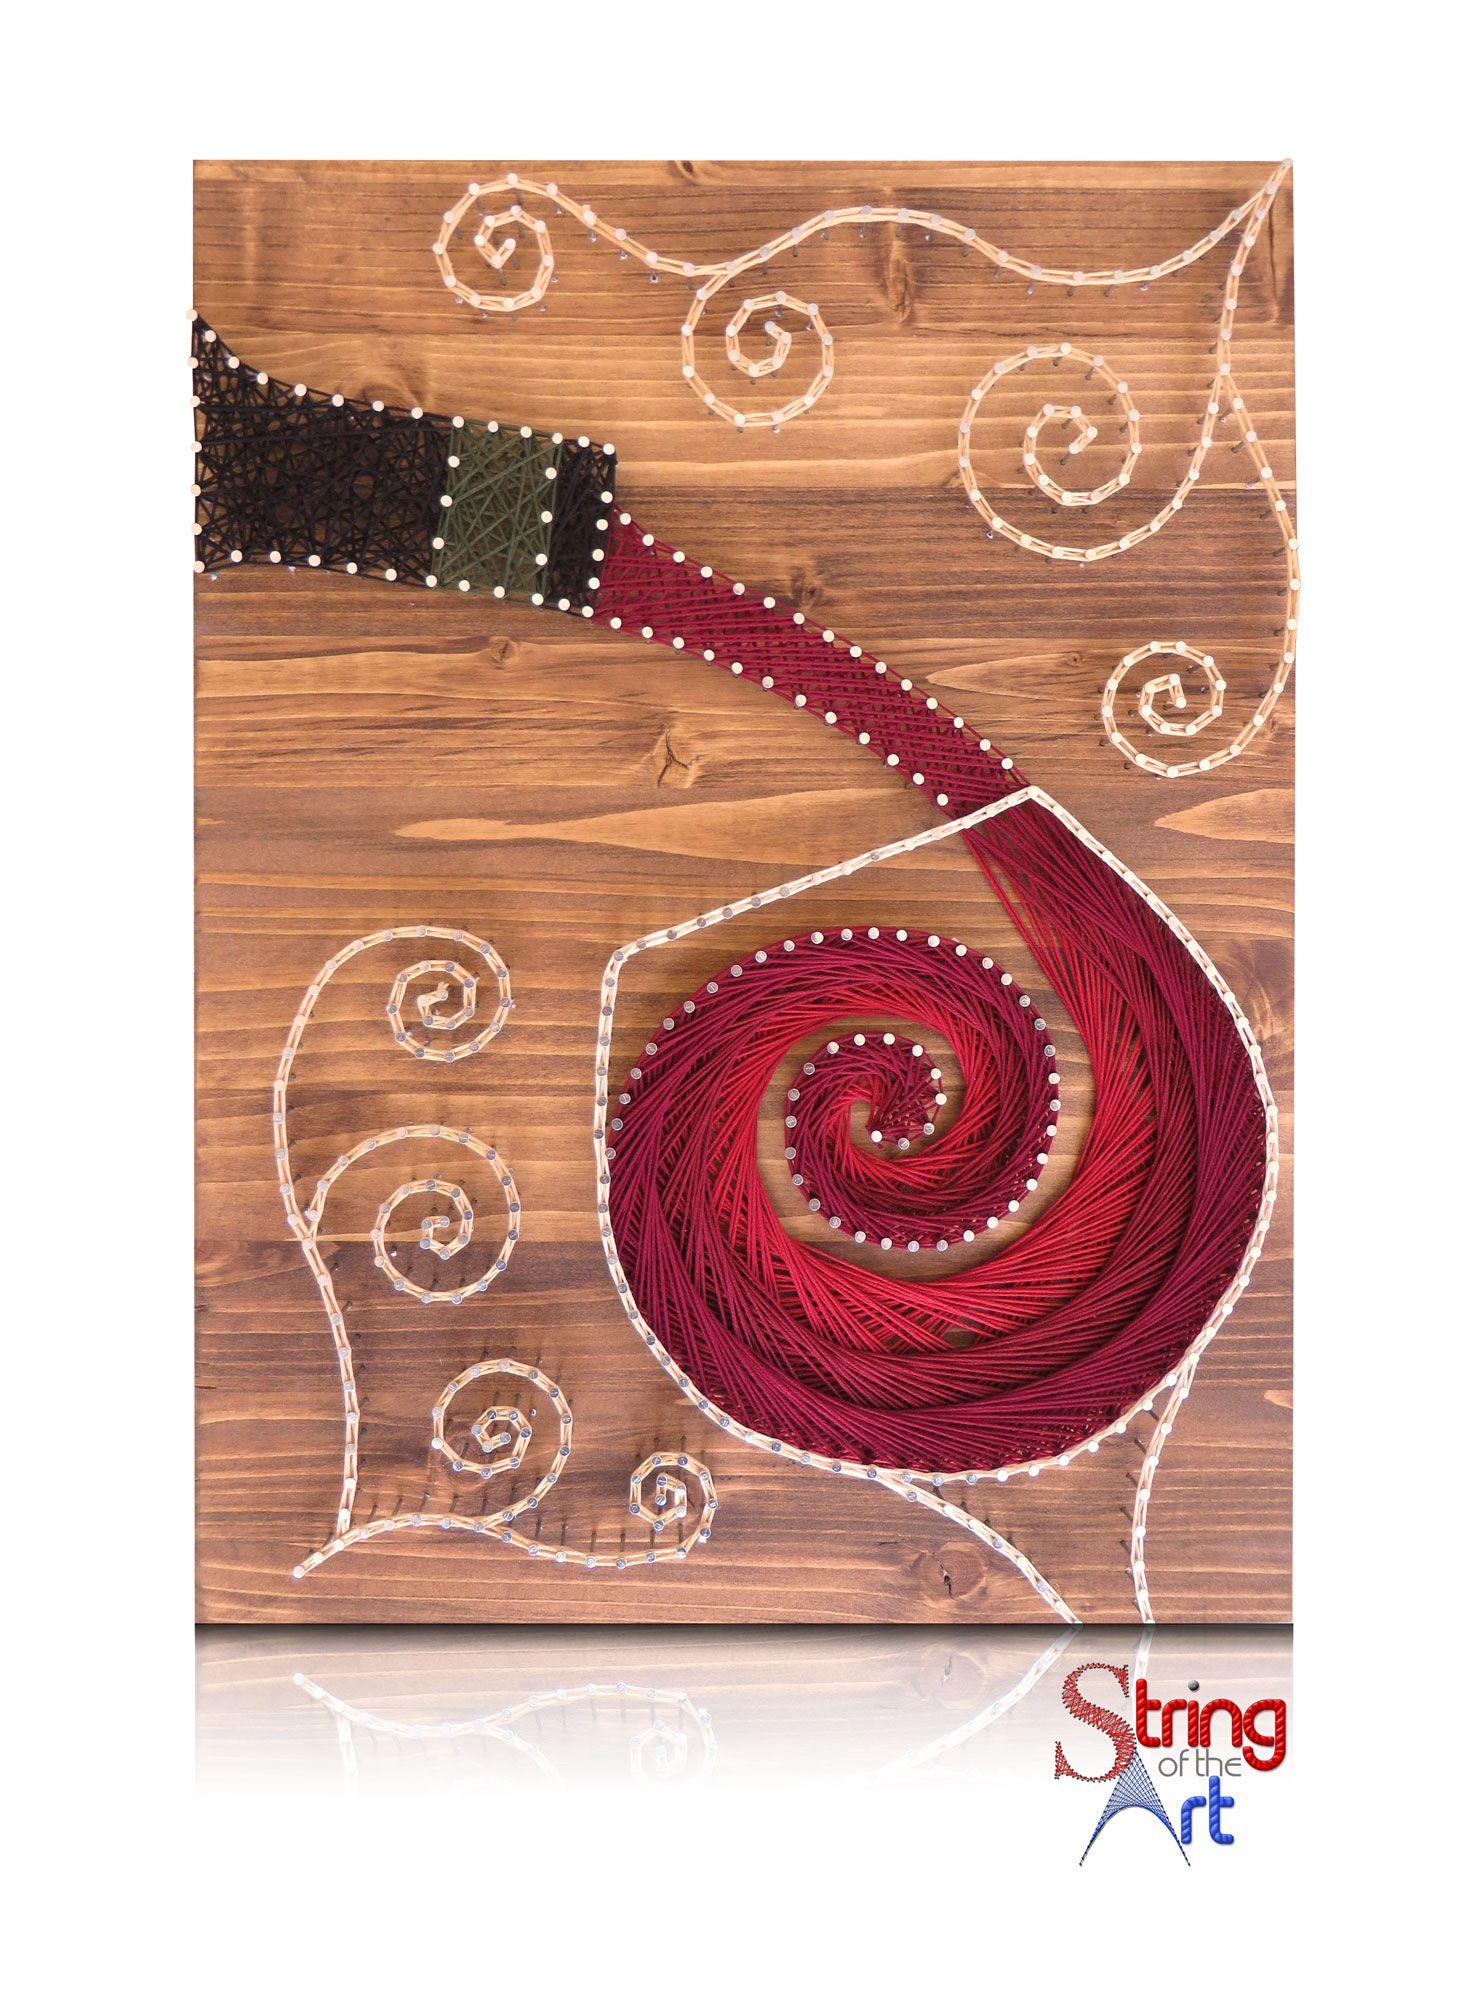 String art craft kit - Diy String Art Kit Wine String Art Visit Www Stringoftheart Com To